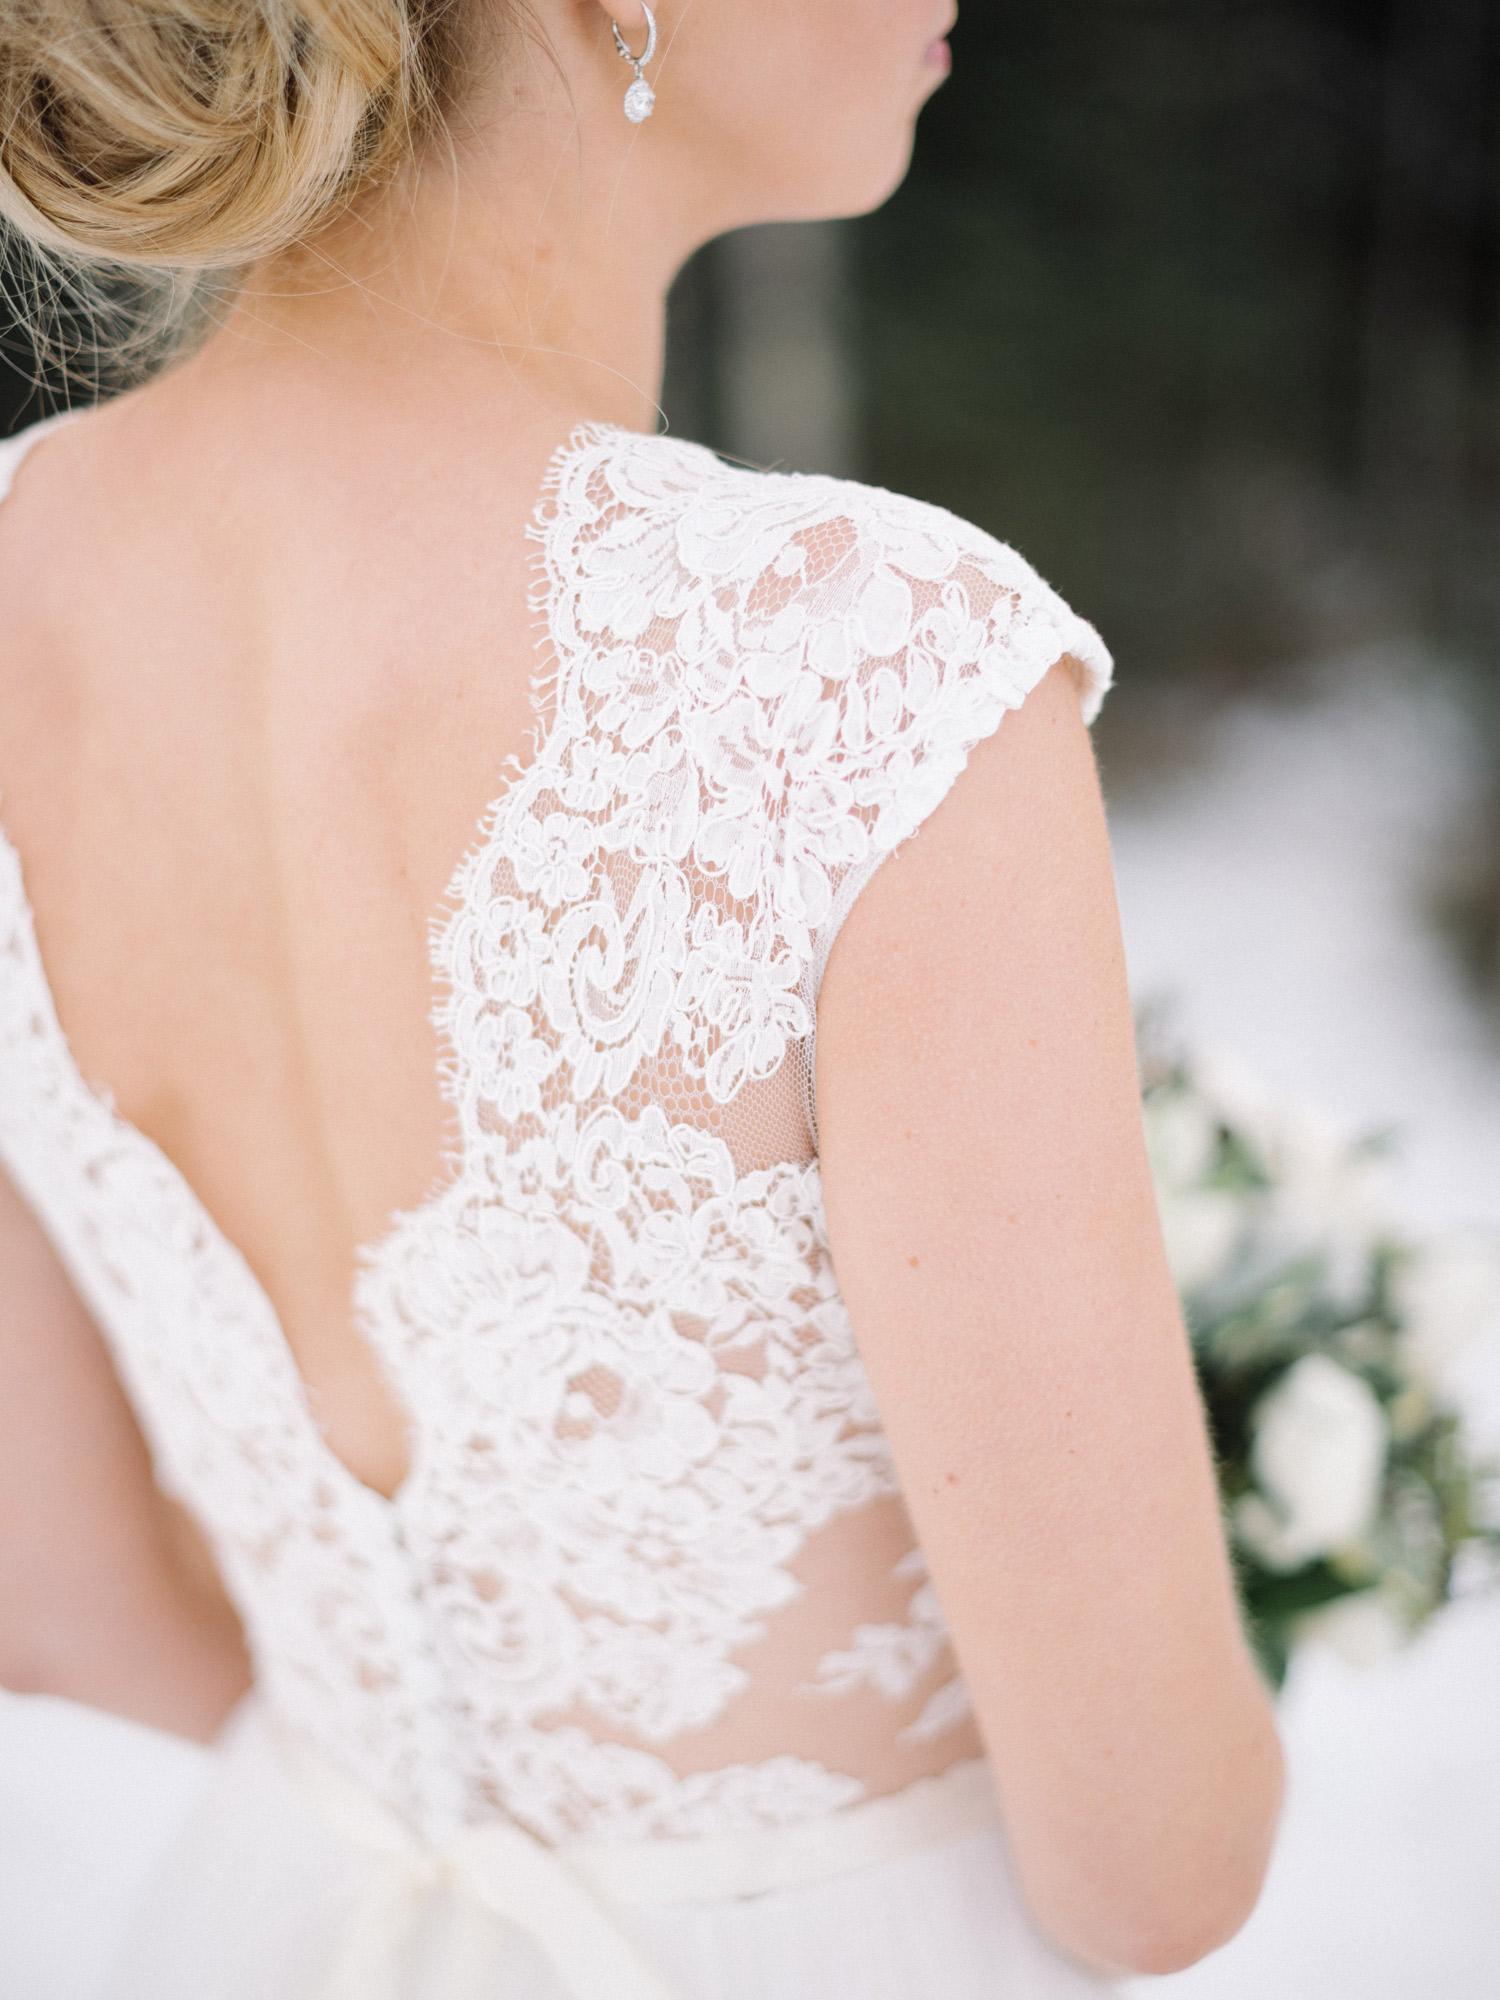 Hera Weddings & Events